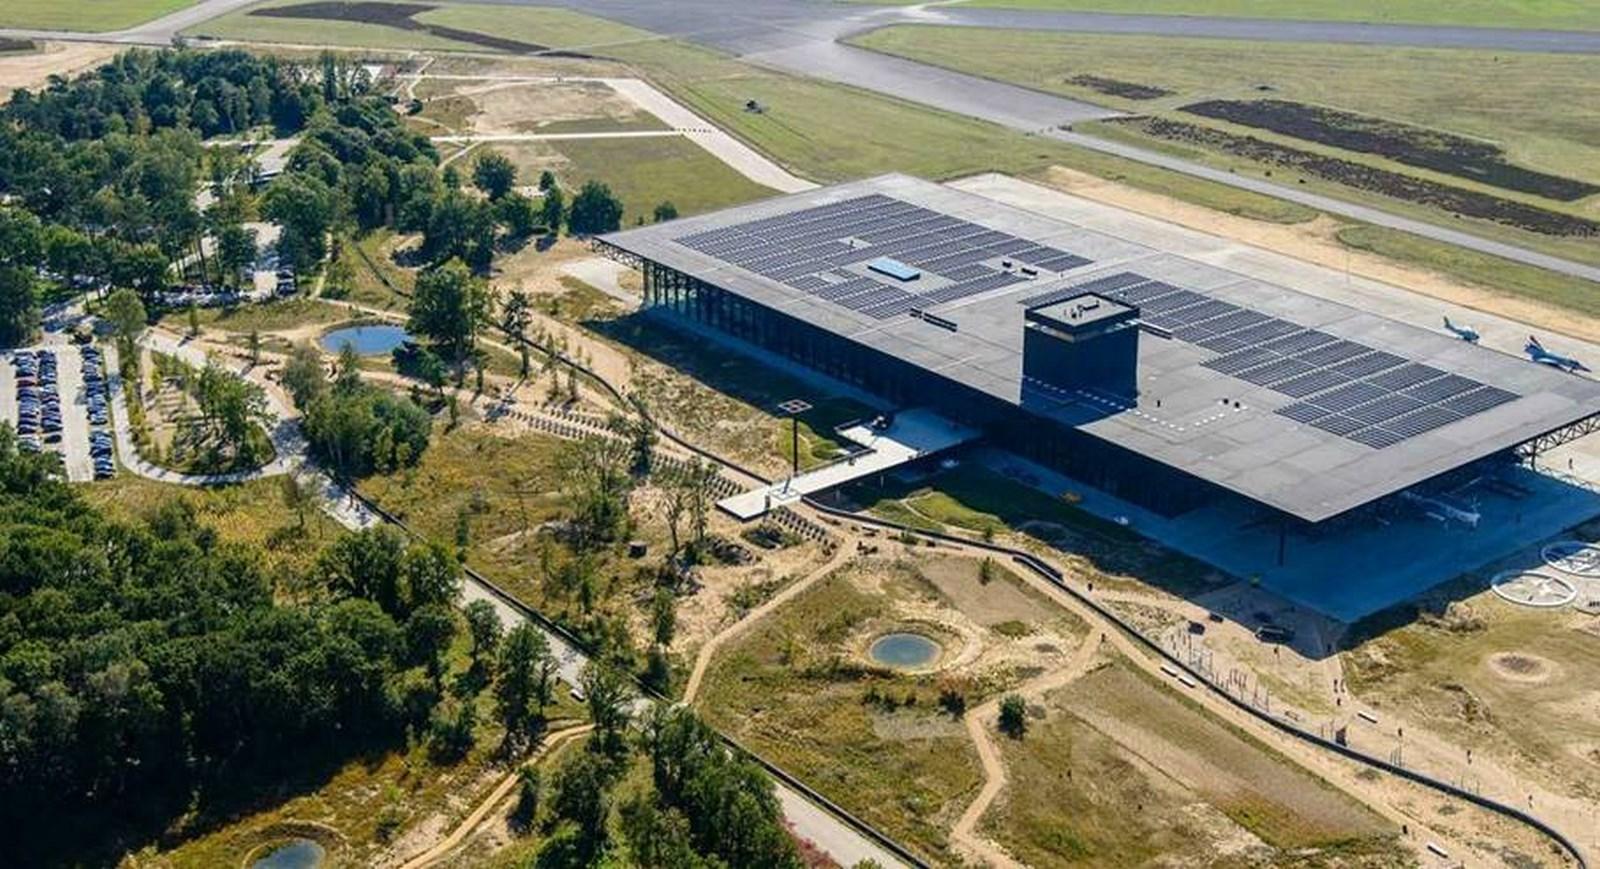 H + N + S Landscape Architects, Amersfoort, Netherland - Sheet6